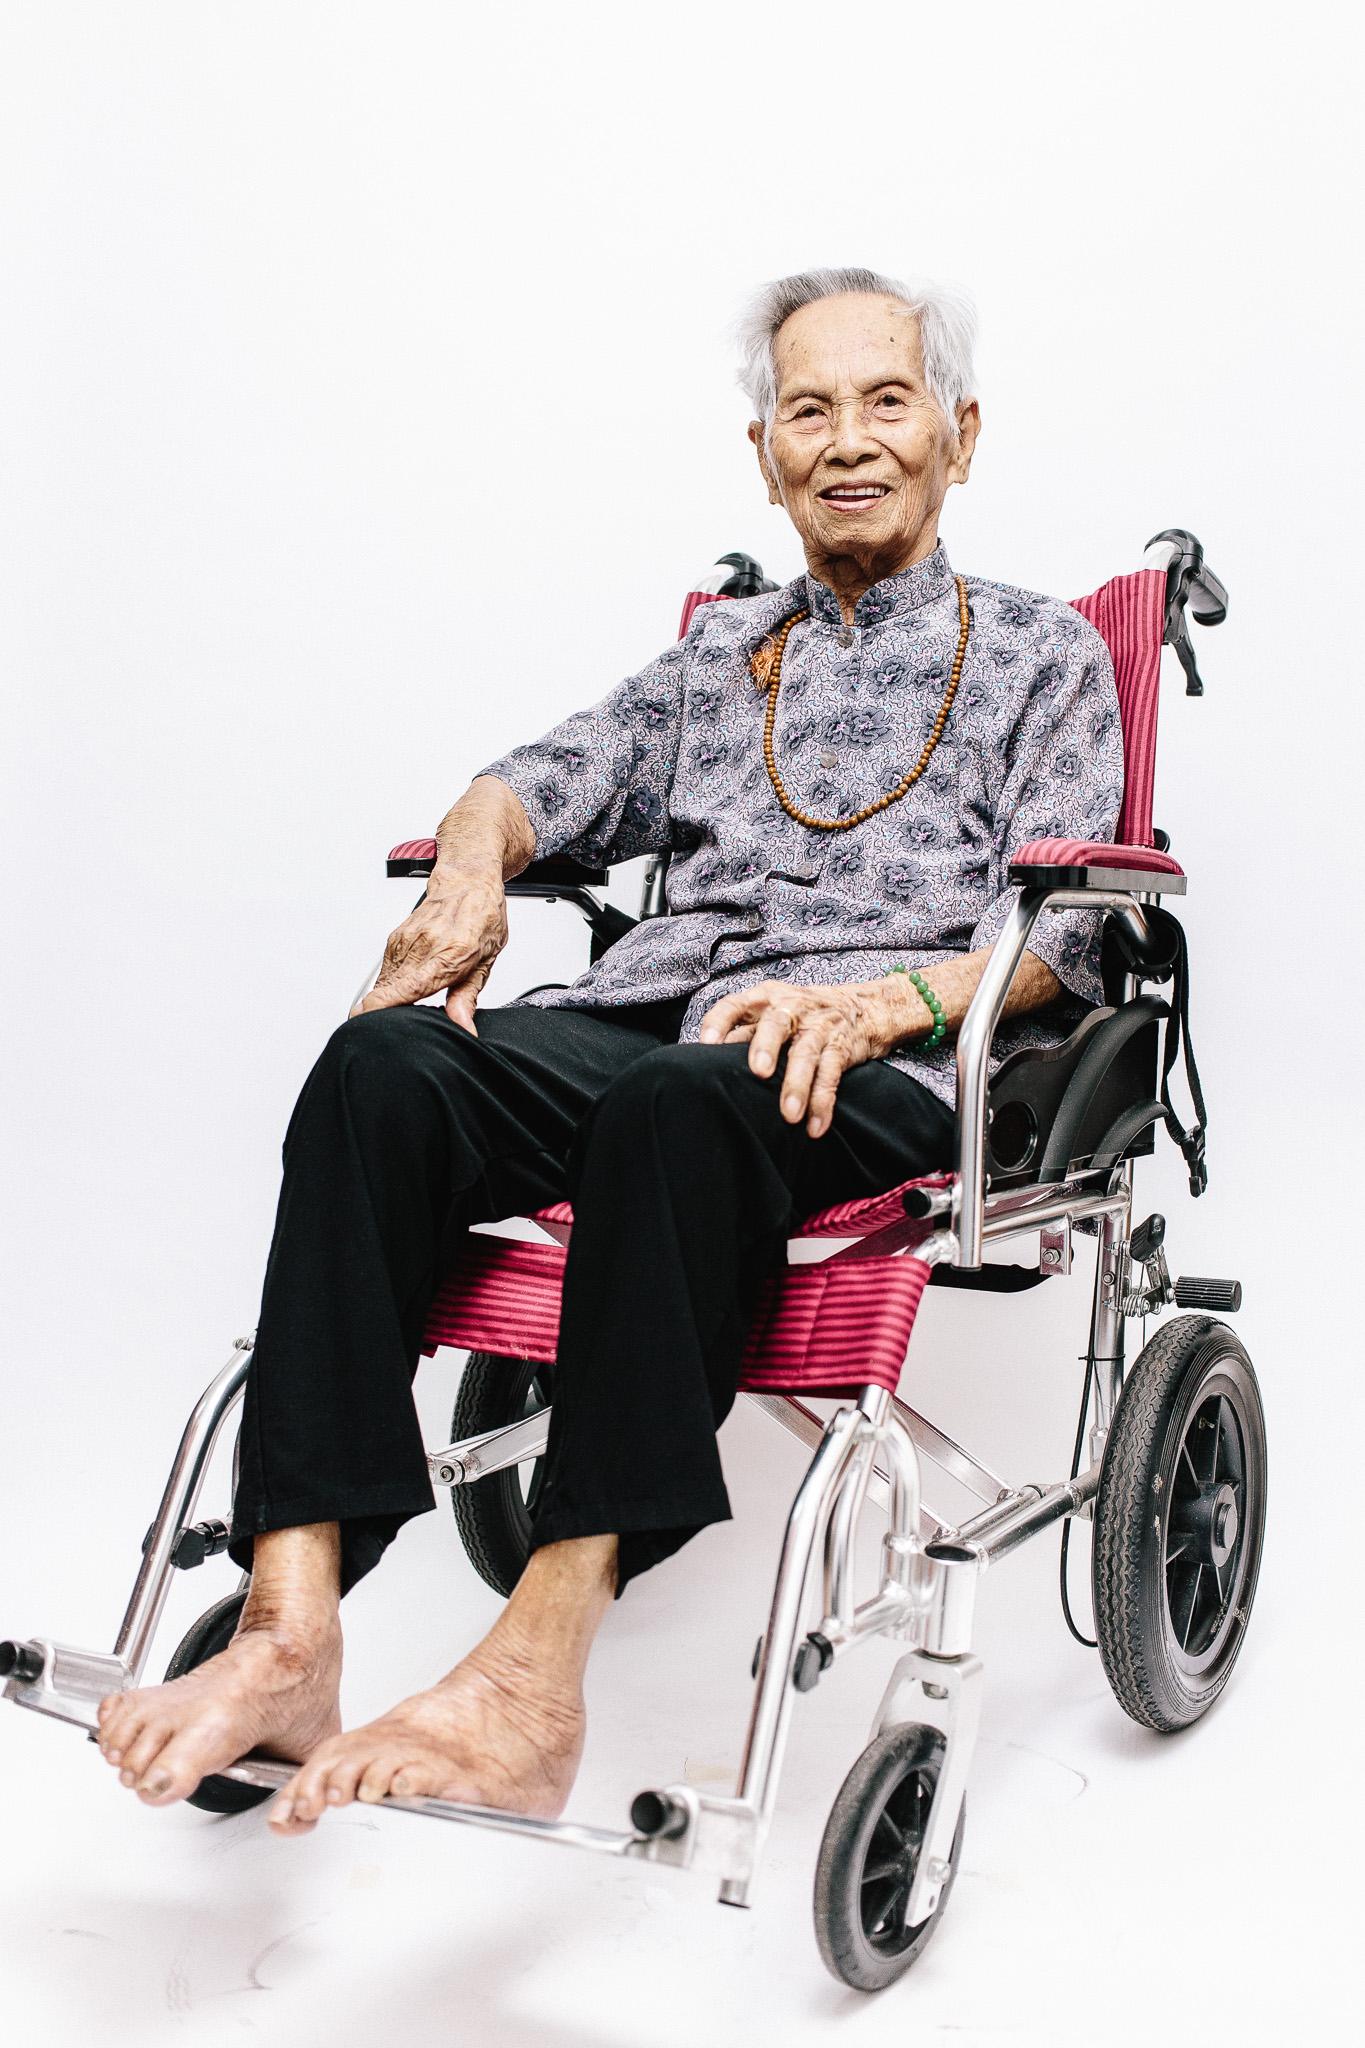 zainal-zainal-studio-centenarians-care-duke-nus-singapore-photographer-10.jpg